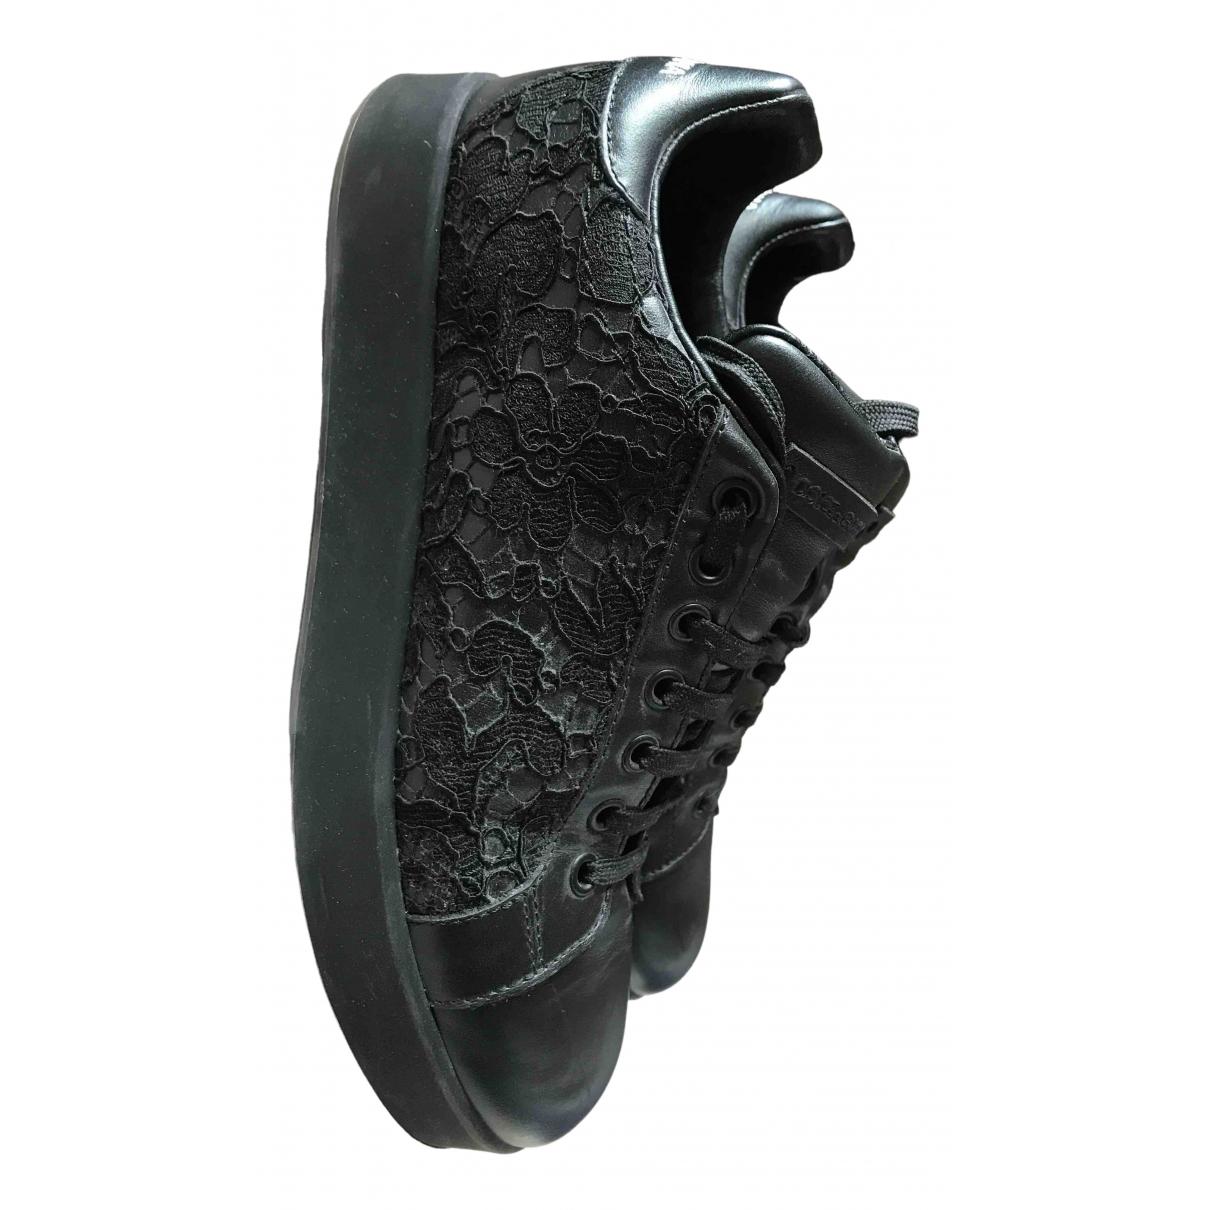 Dolce & Gabbana Portofino Black Leather Trainers for Women 38.5 IT